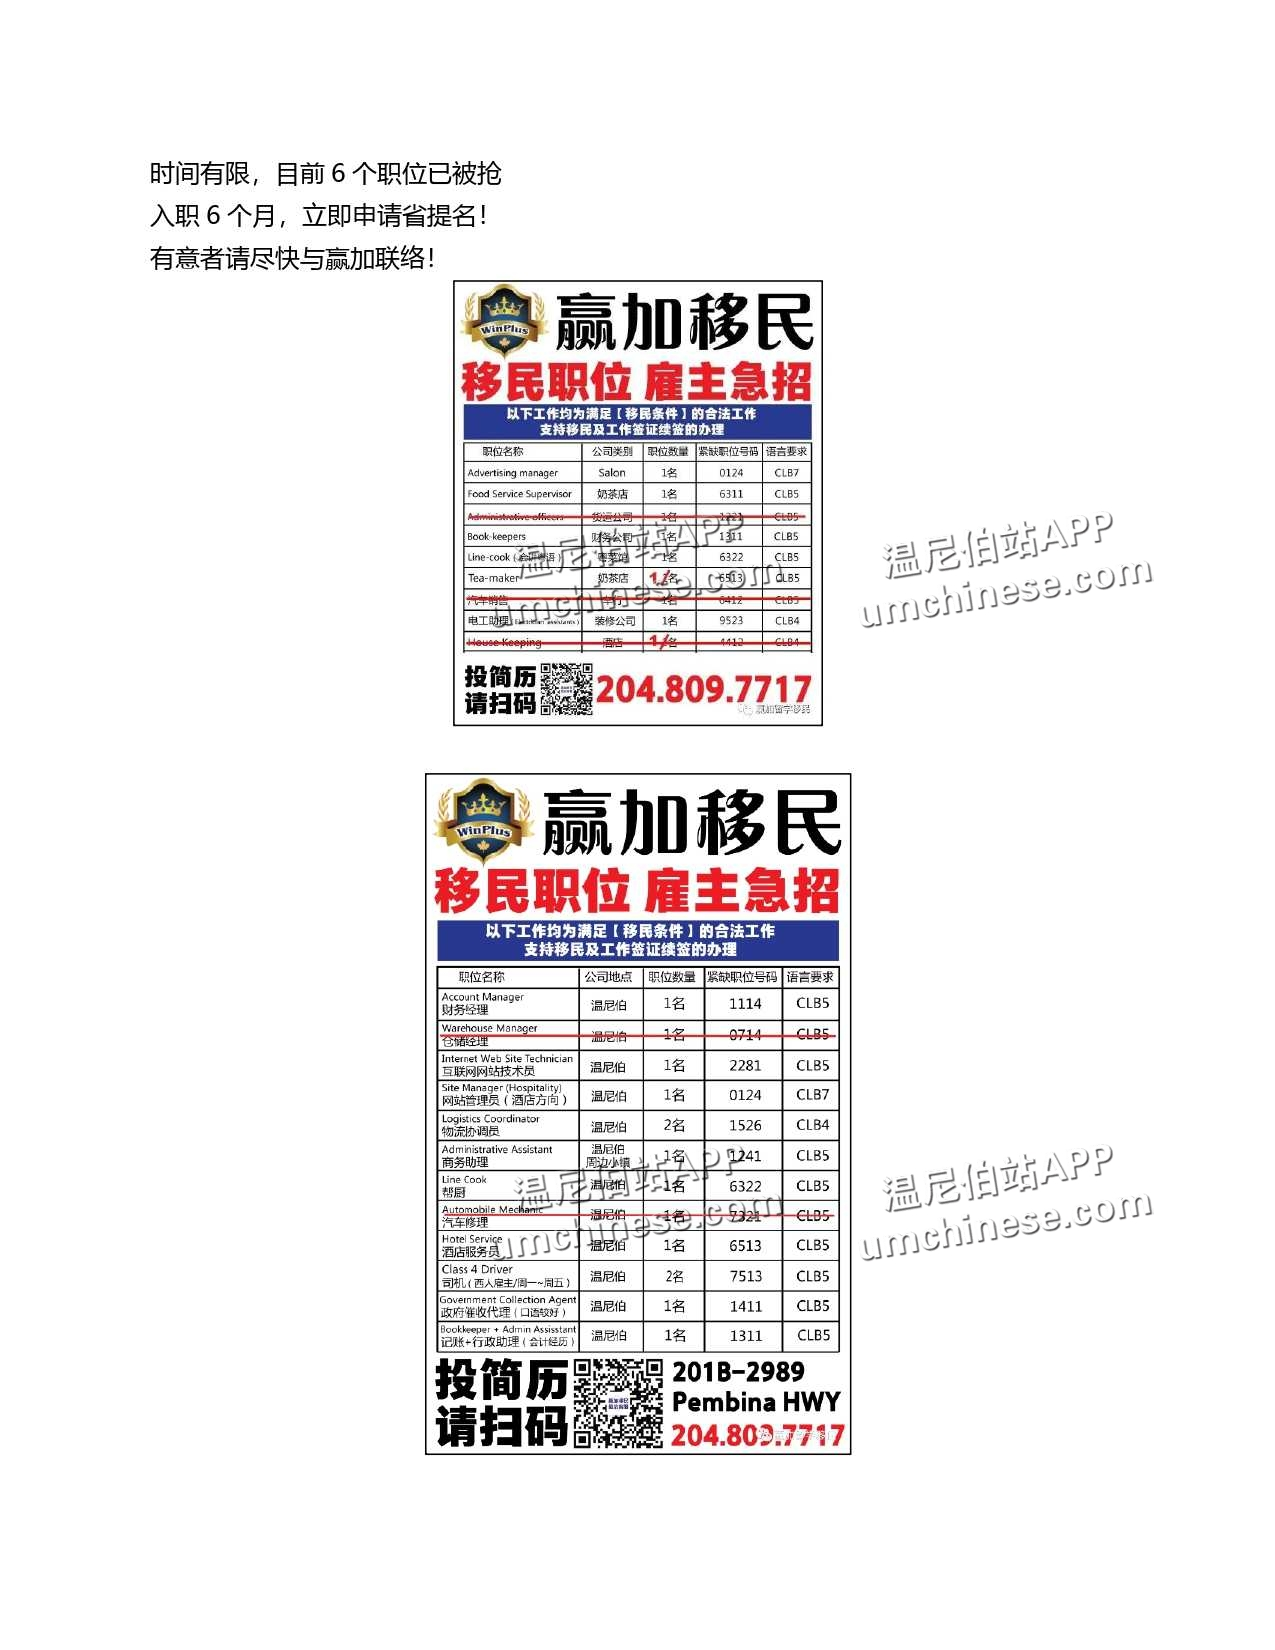 香港政策_page-0003.jpg